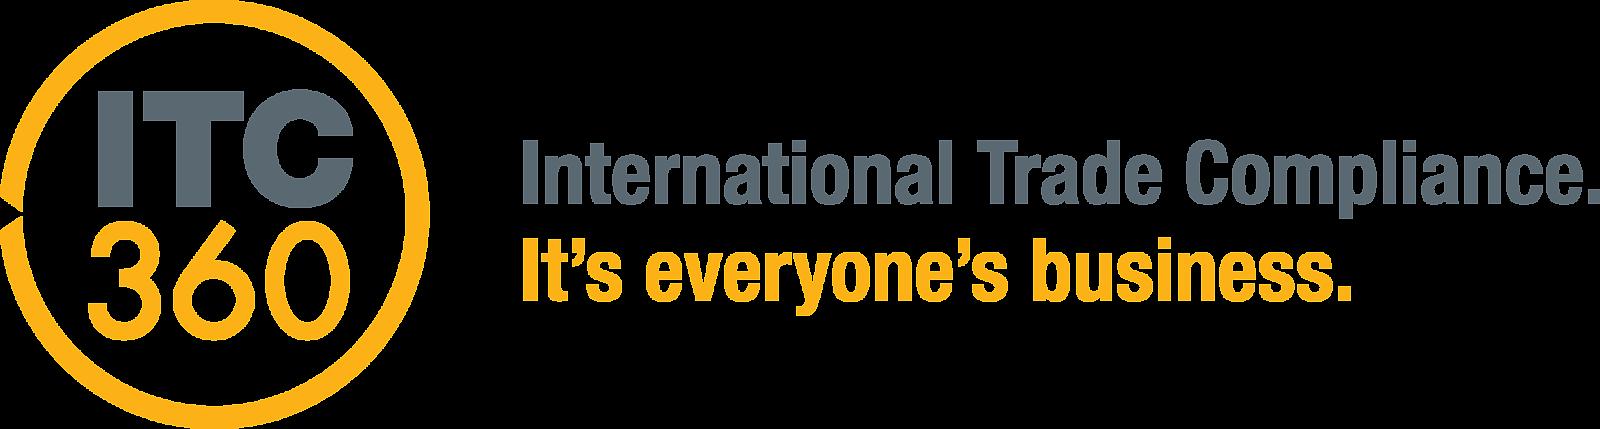 ITC360 logo